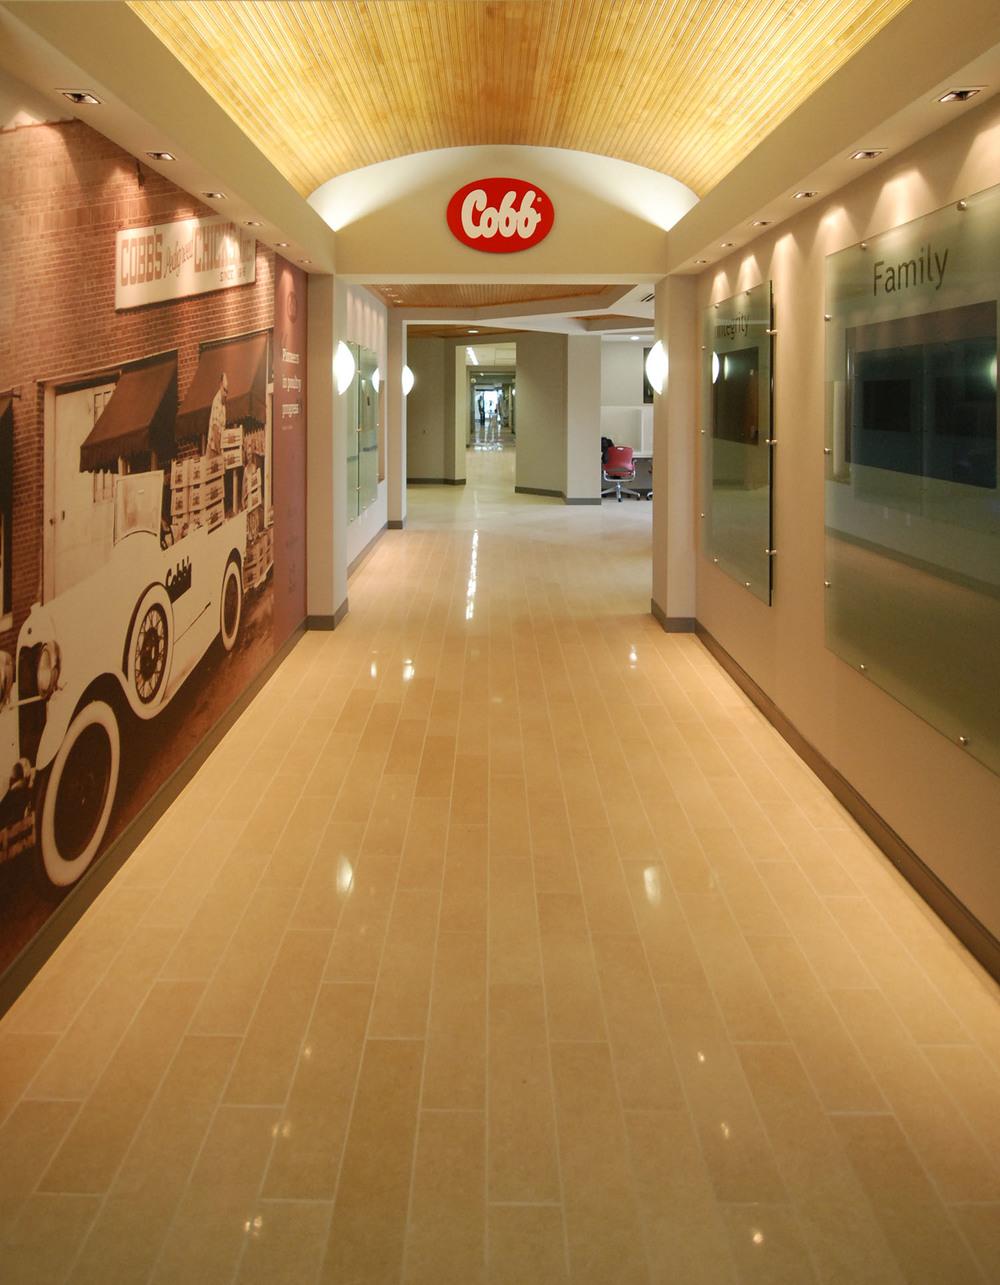 Cobb_Corporate_Office_Siloam_Springs.jpg